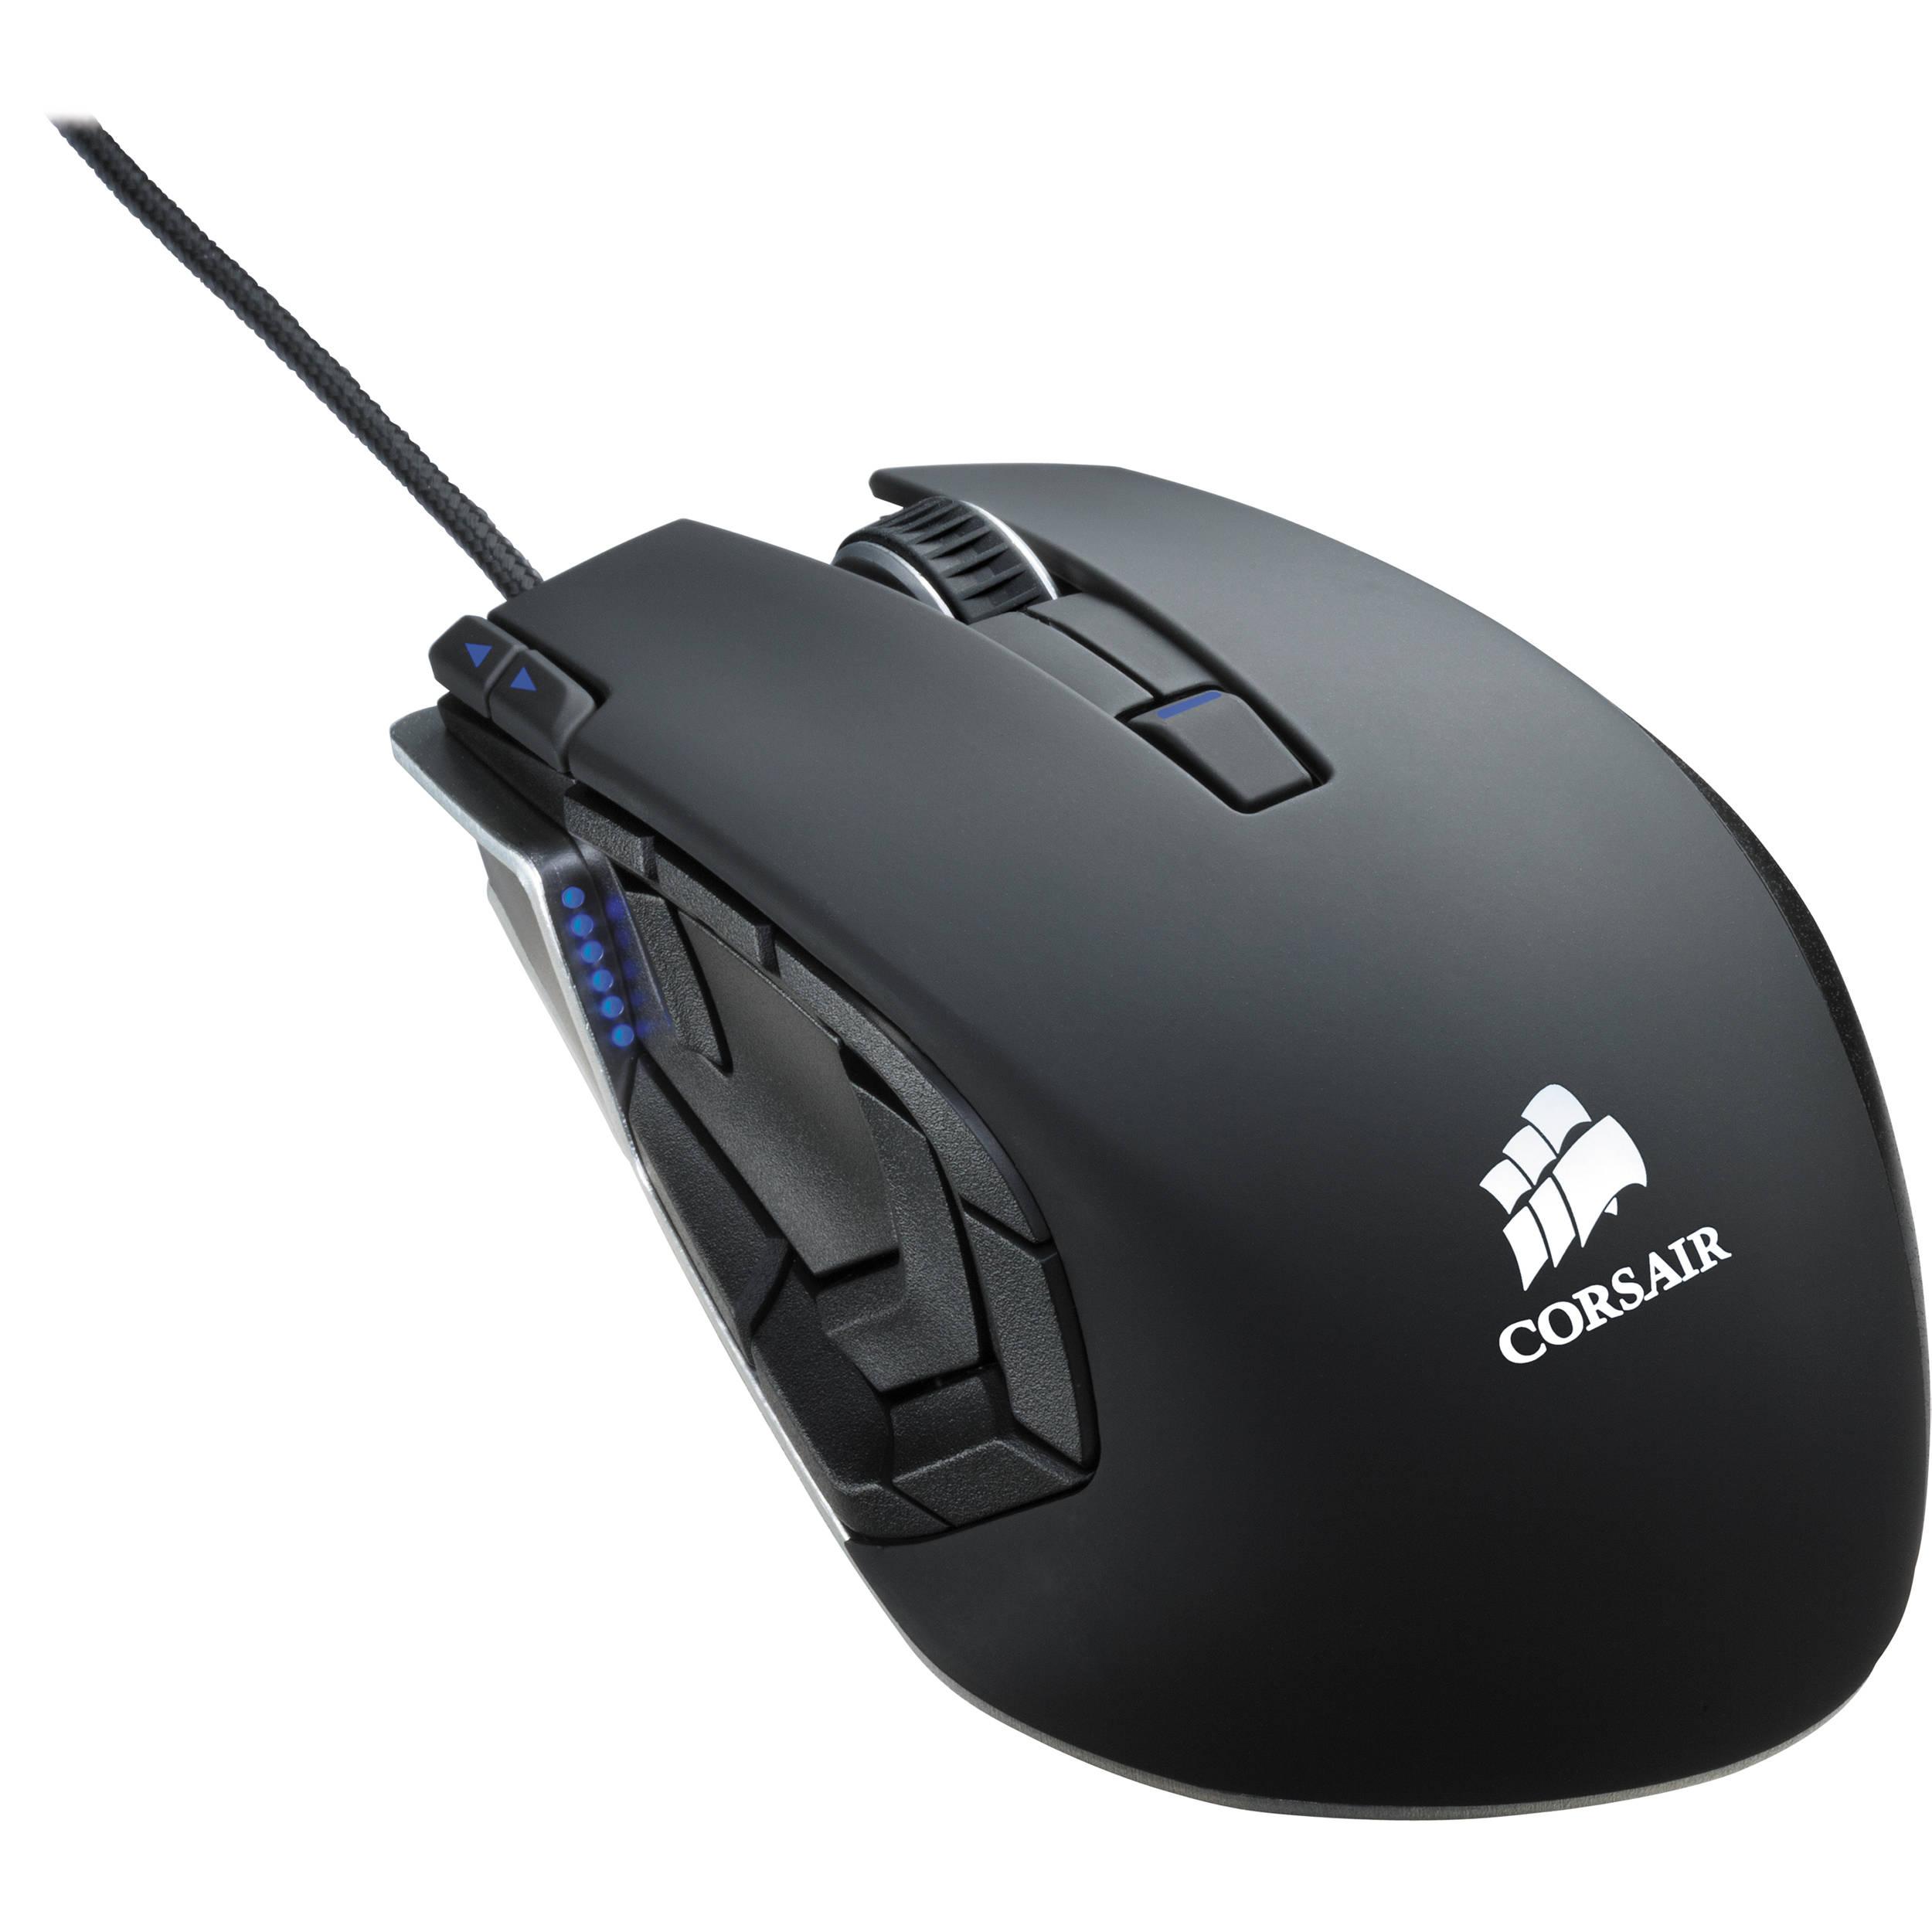 Drivers Update: Corsair Vengeance M95 Mouse